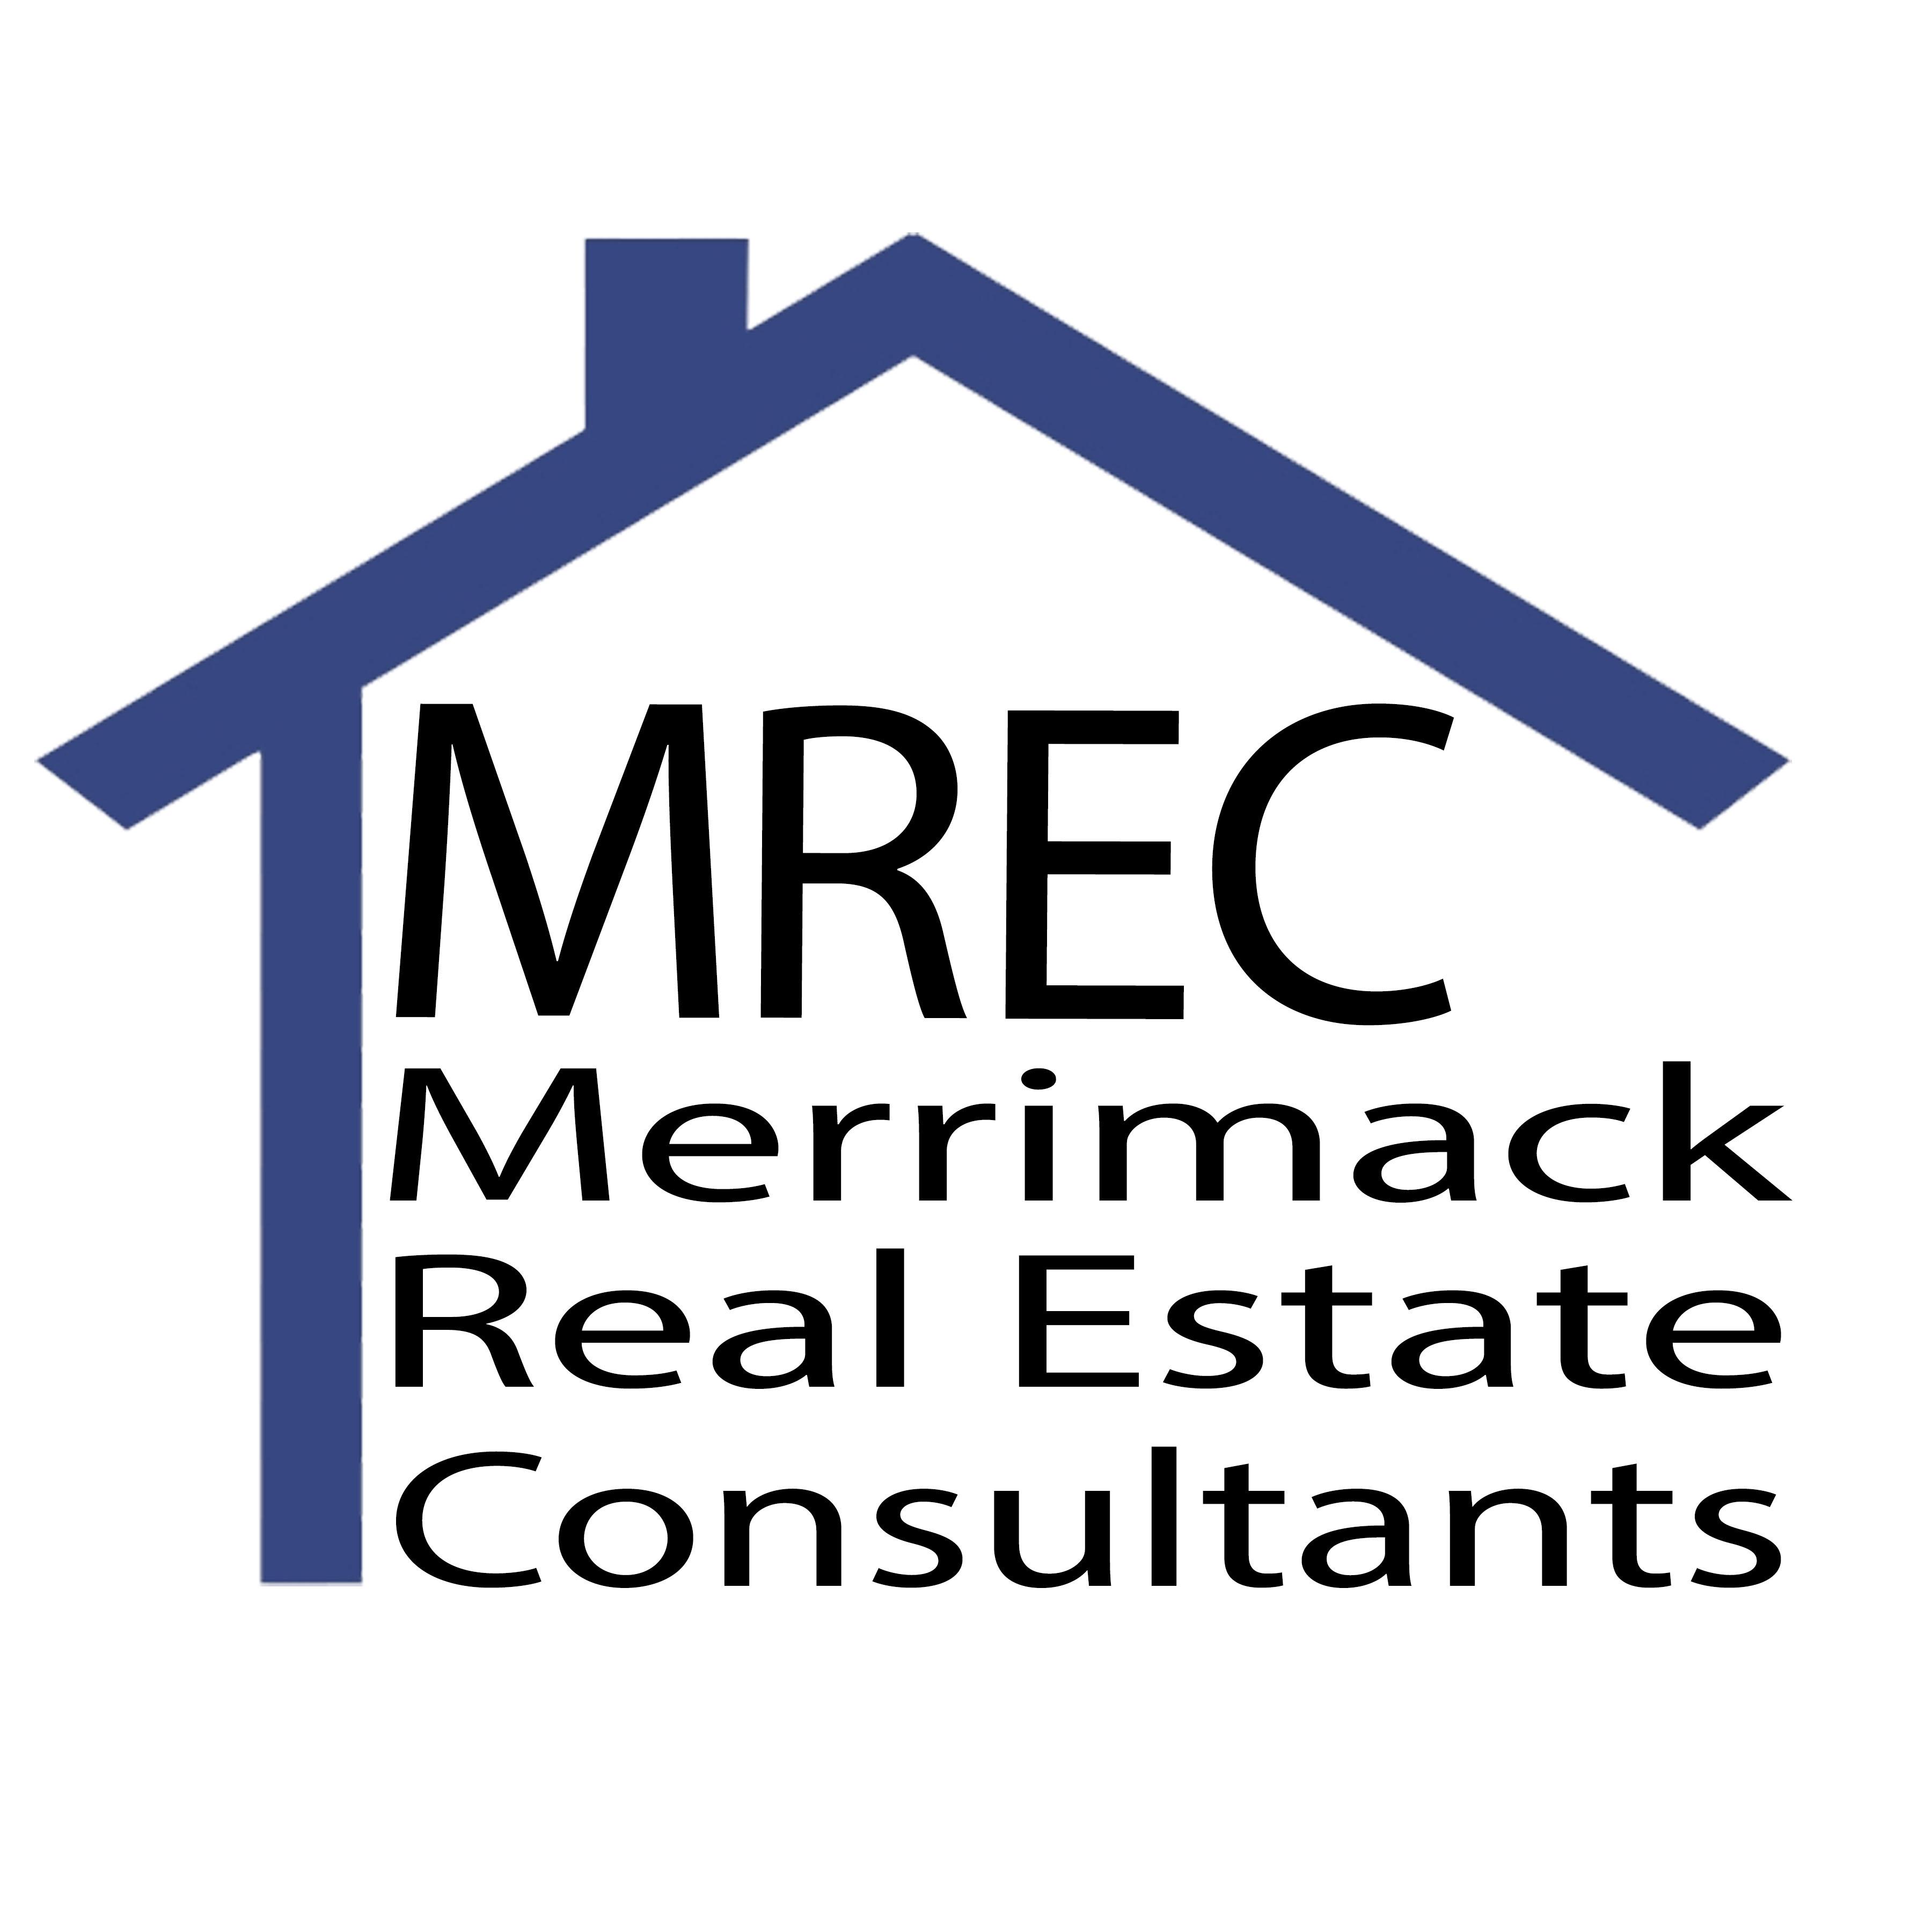 Merrimack Real Estate Consultants